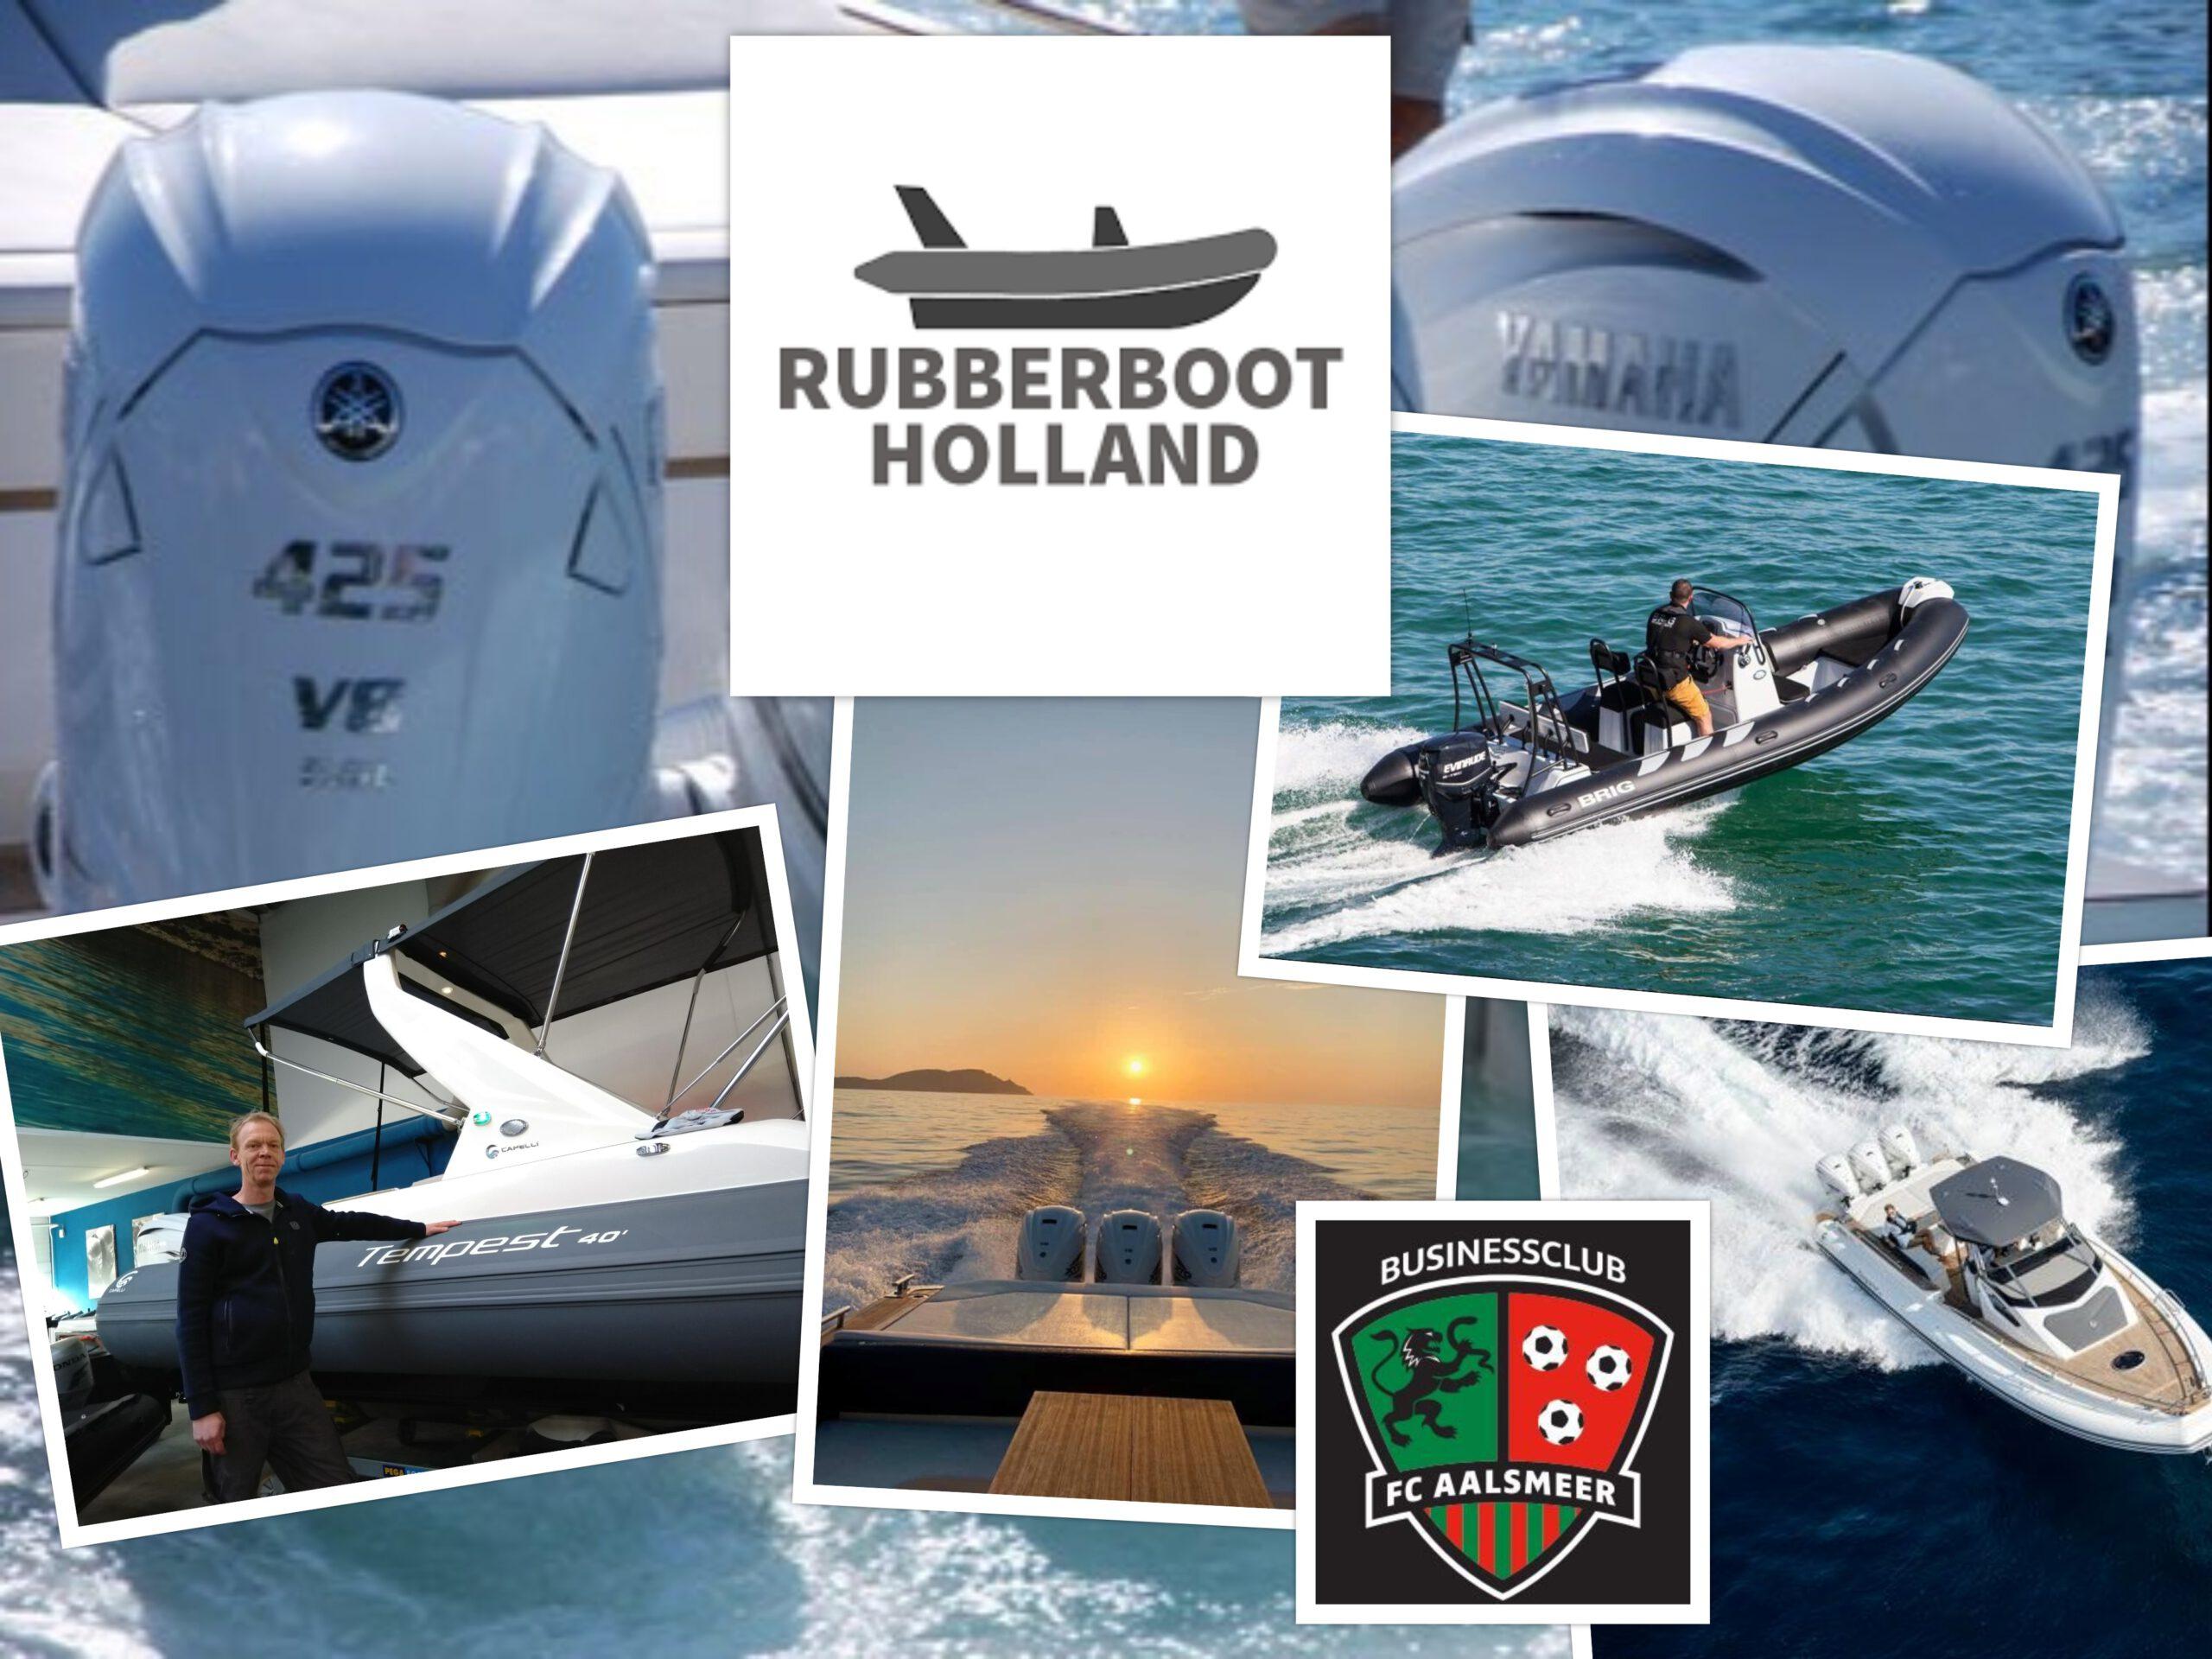 Businessclub-fc-aalsmeer-rubberboot-holland